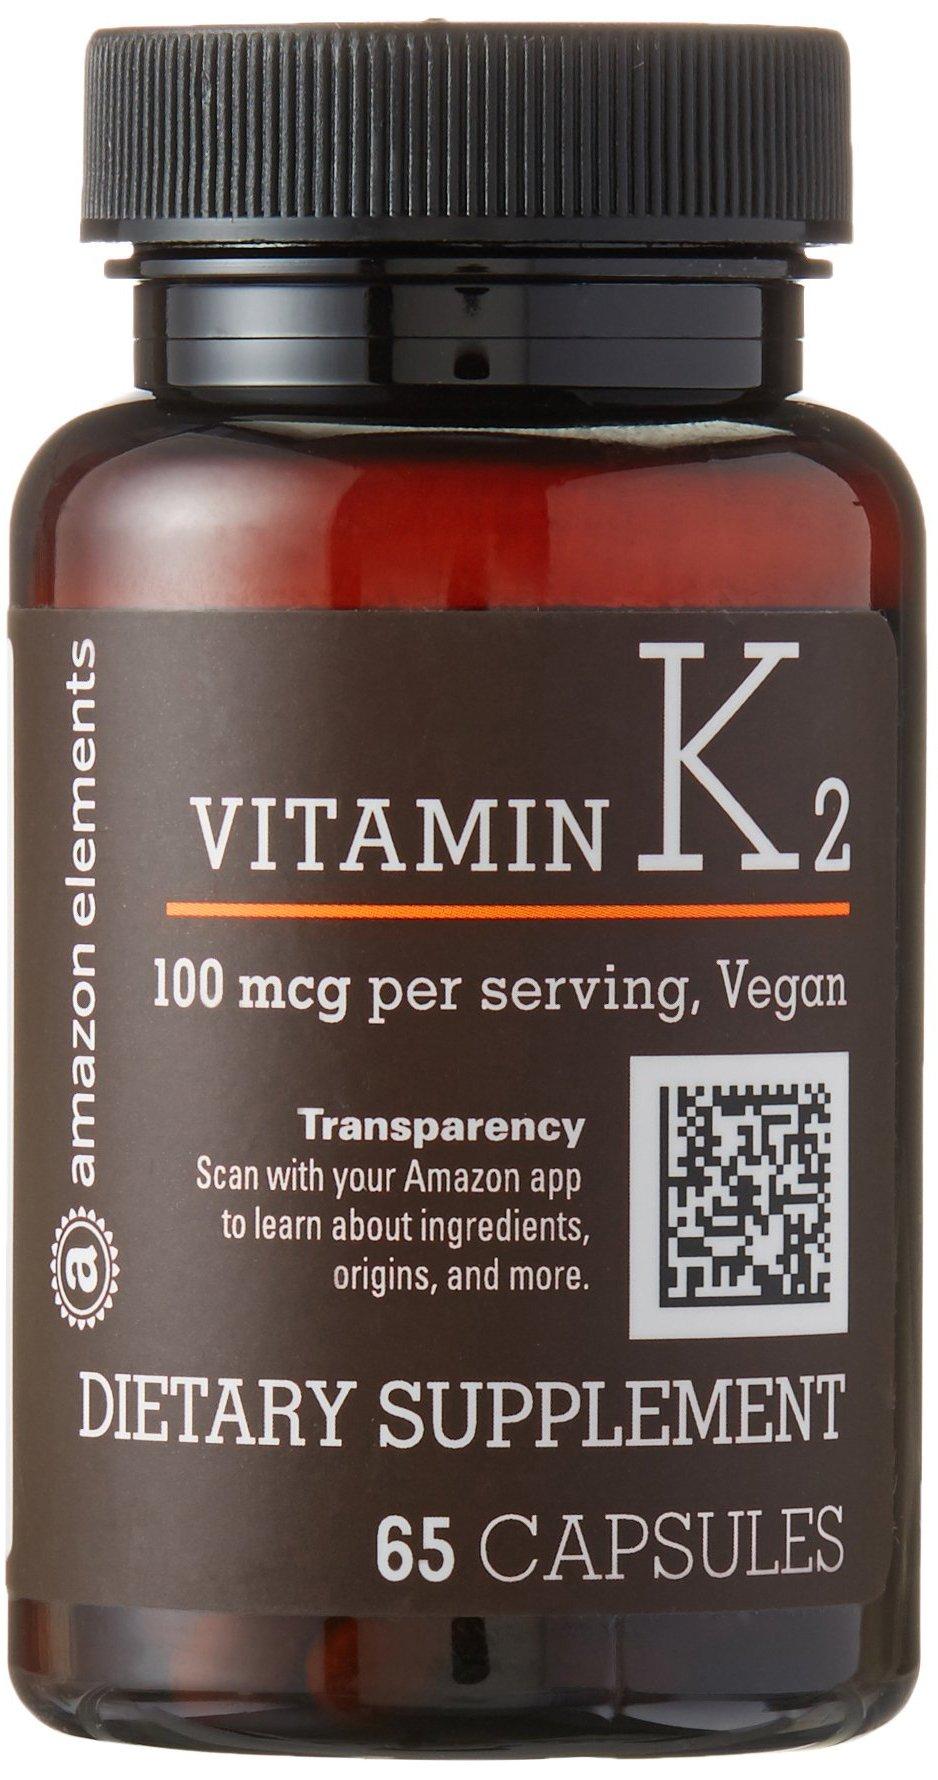 Amazon Brand - Amazon Elements Vitamin K2 100 mcg, Vegan, 65 Capsules, 2